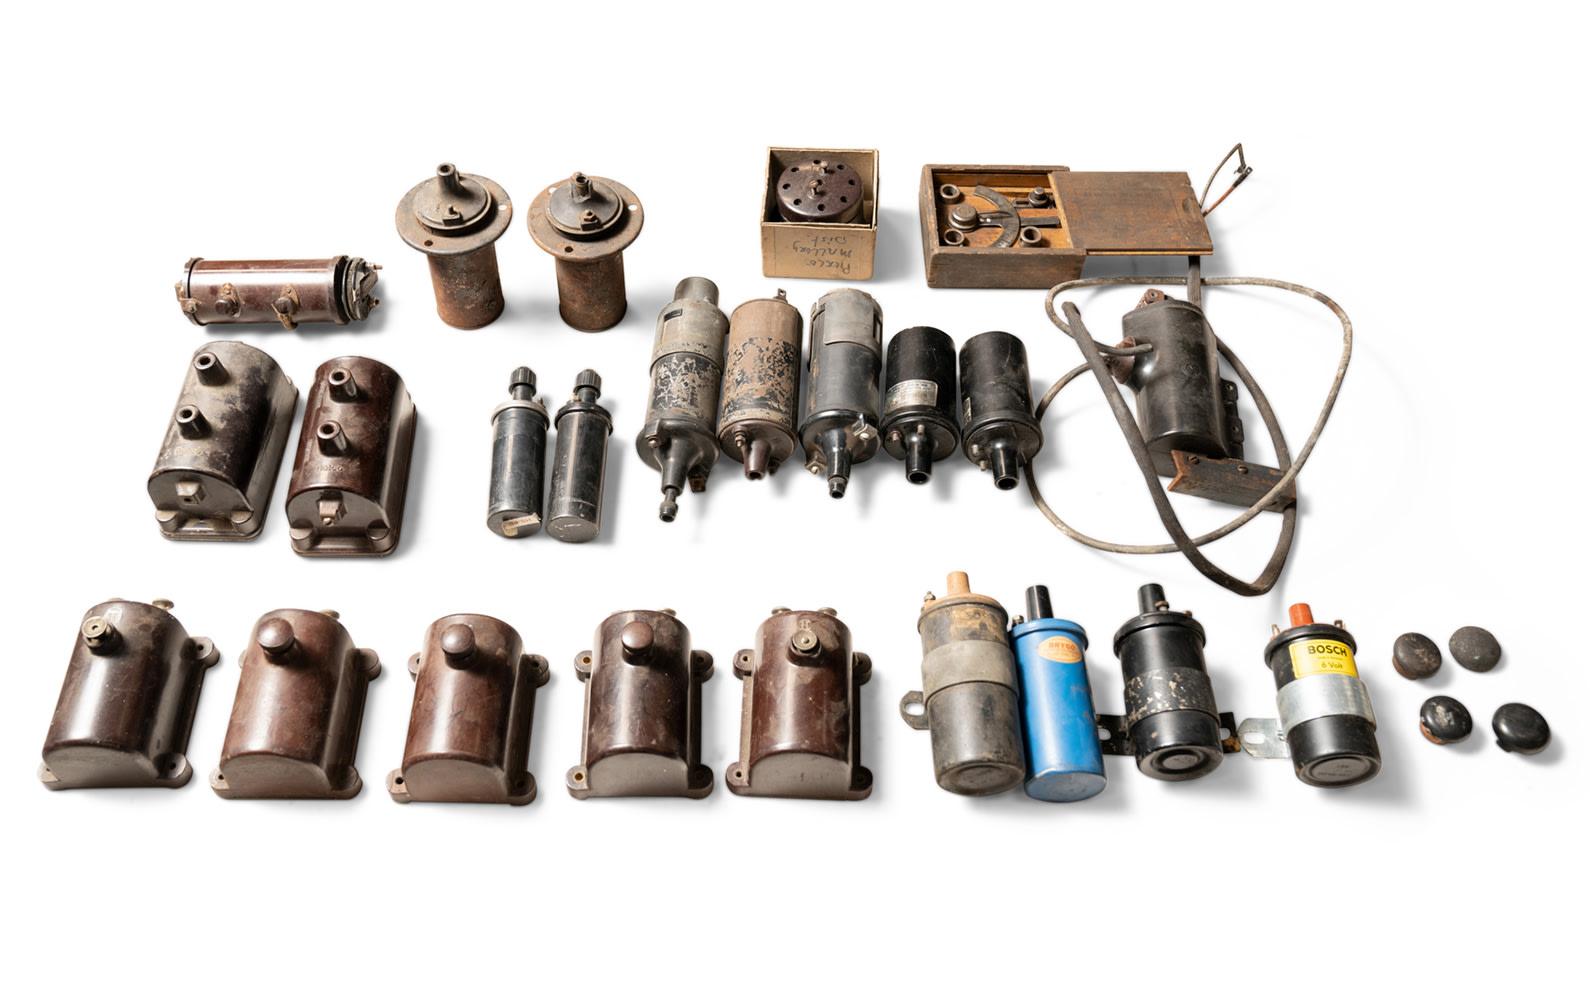 Assorted Prewar and Postwar Coils and Accessories